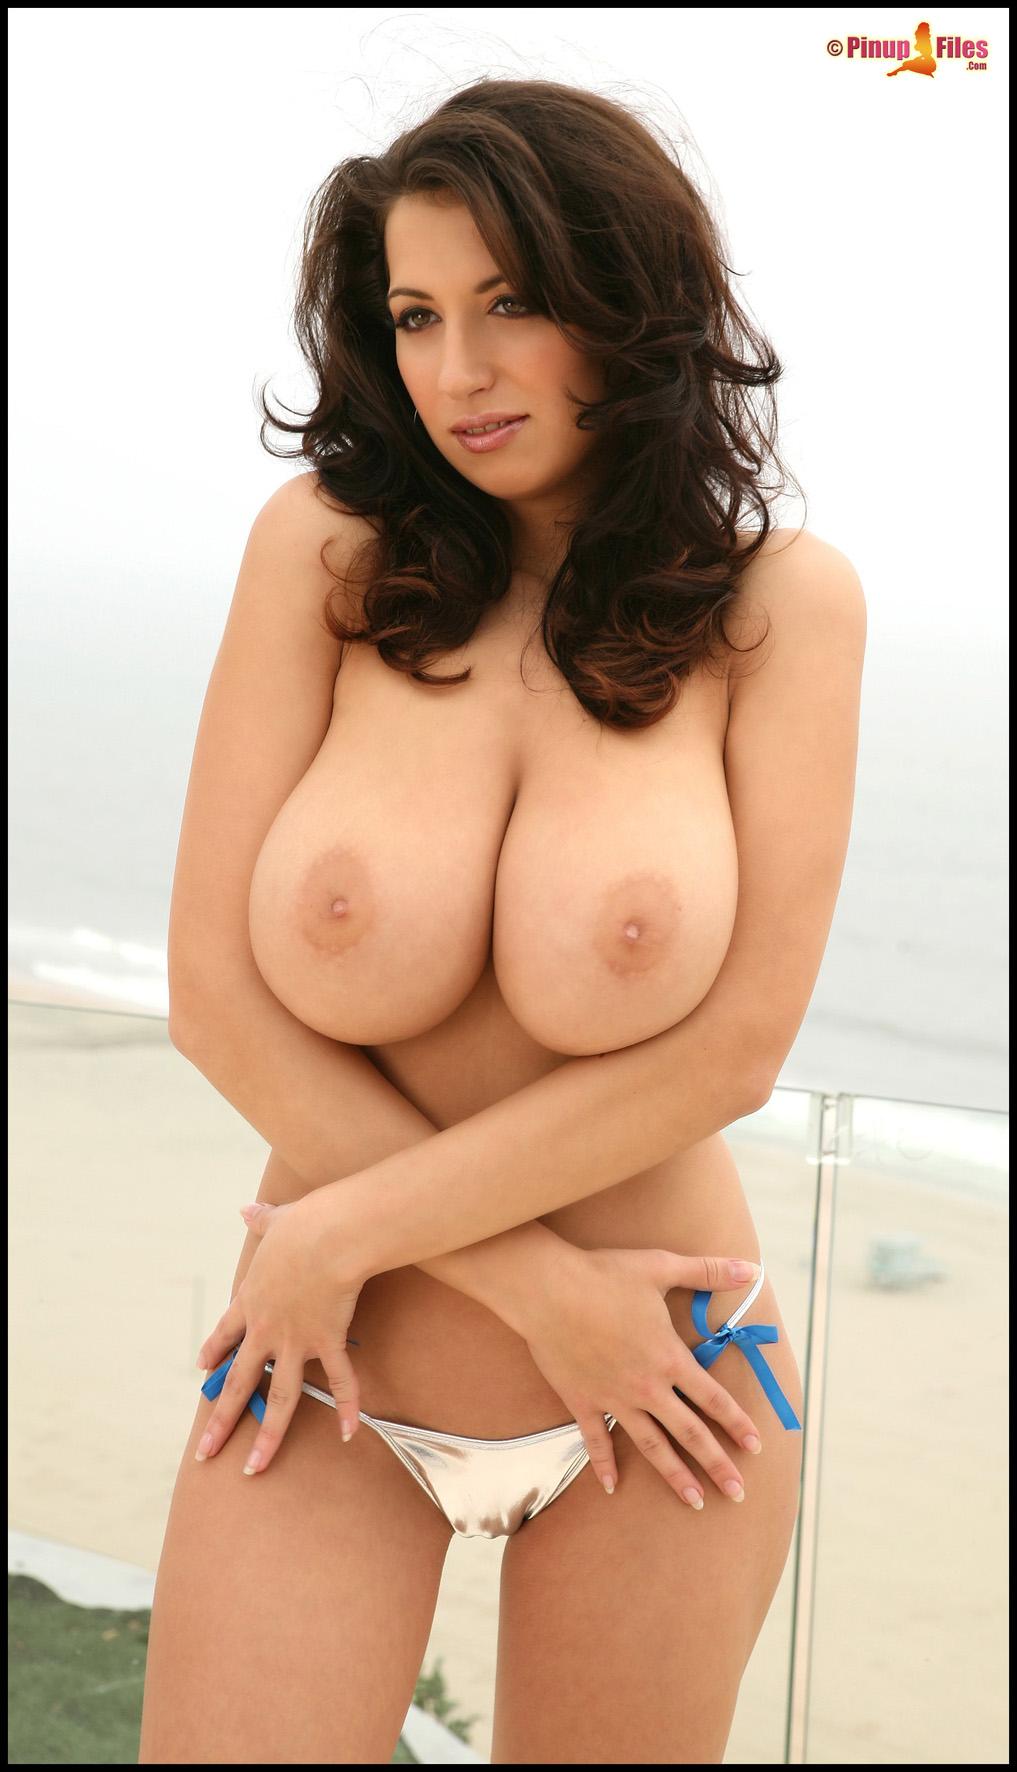 Jana defi big boobs bikinis are